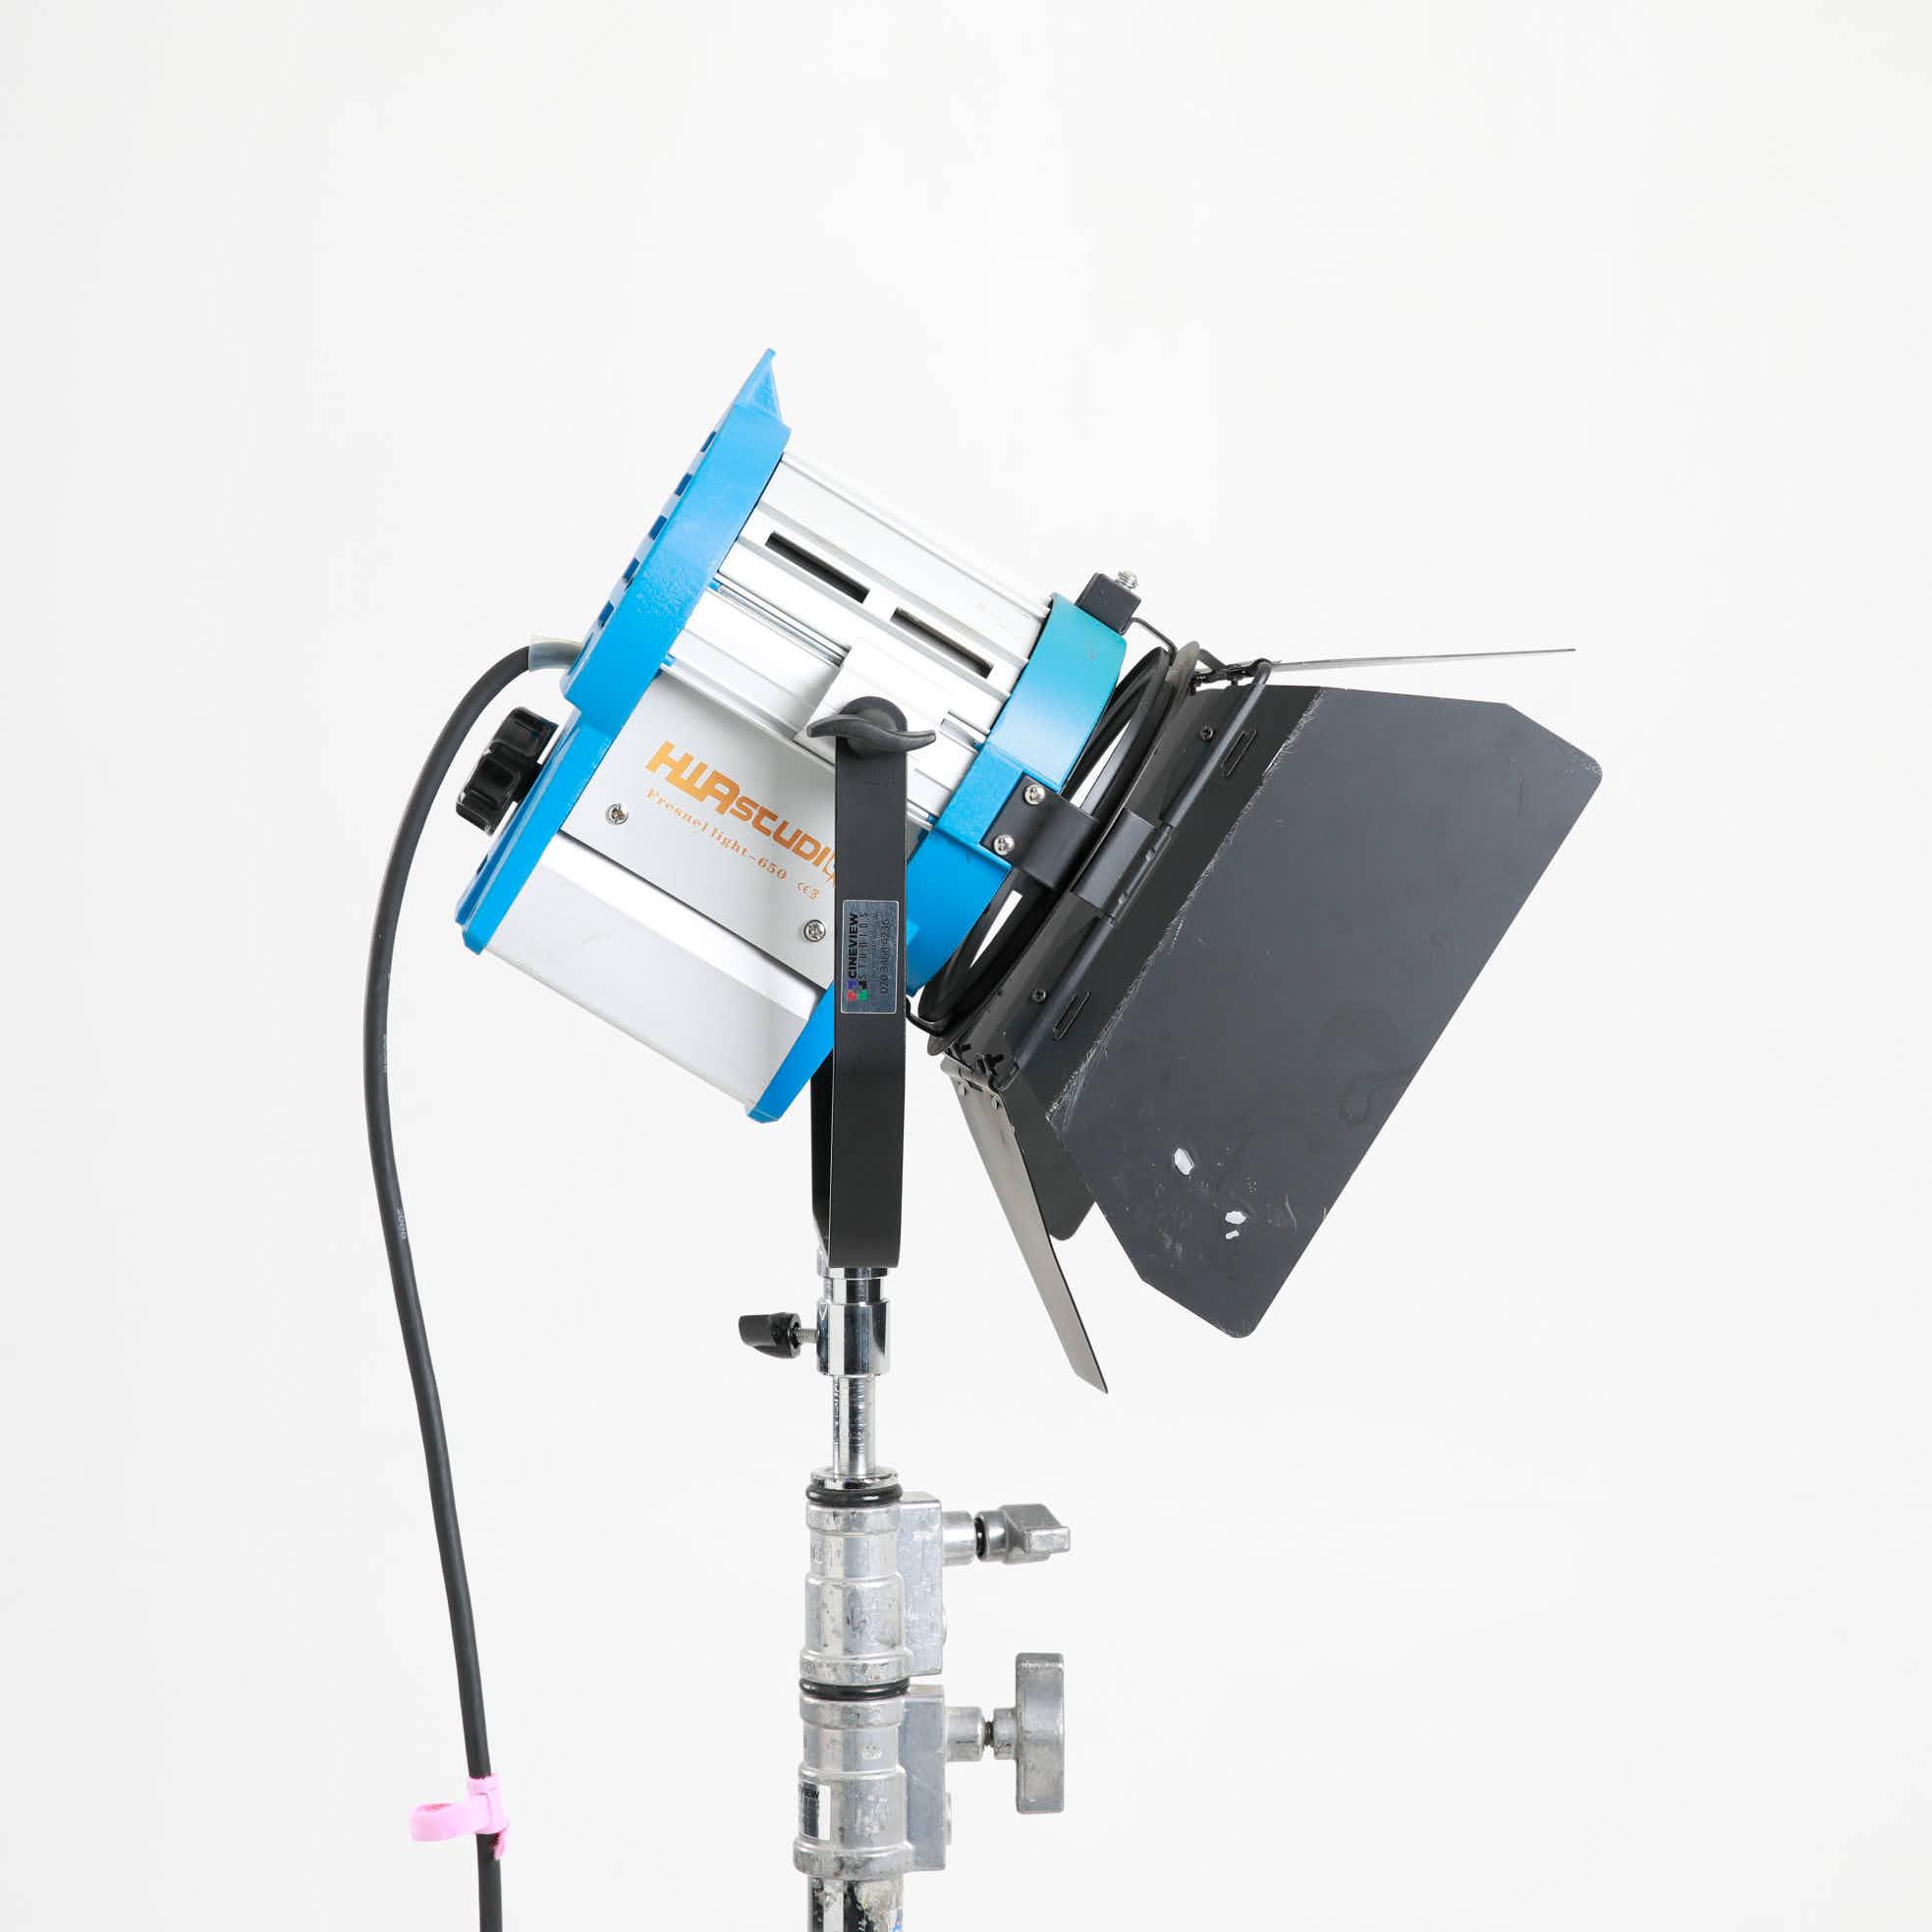 Studio Lighting Rental: Hwastudio Light 650w Continuous Lights